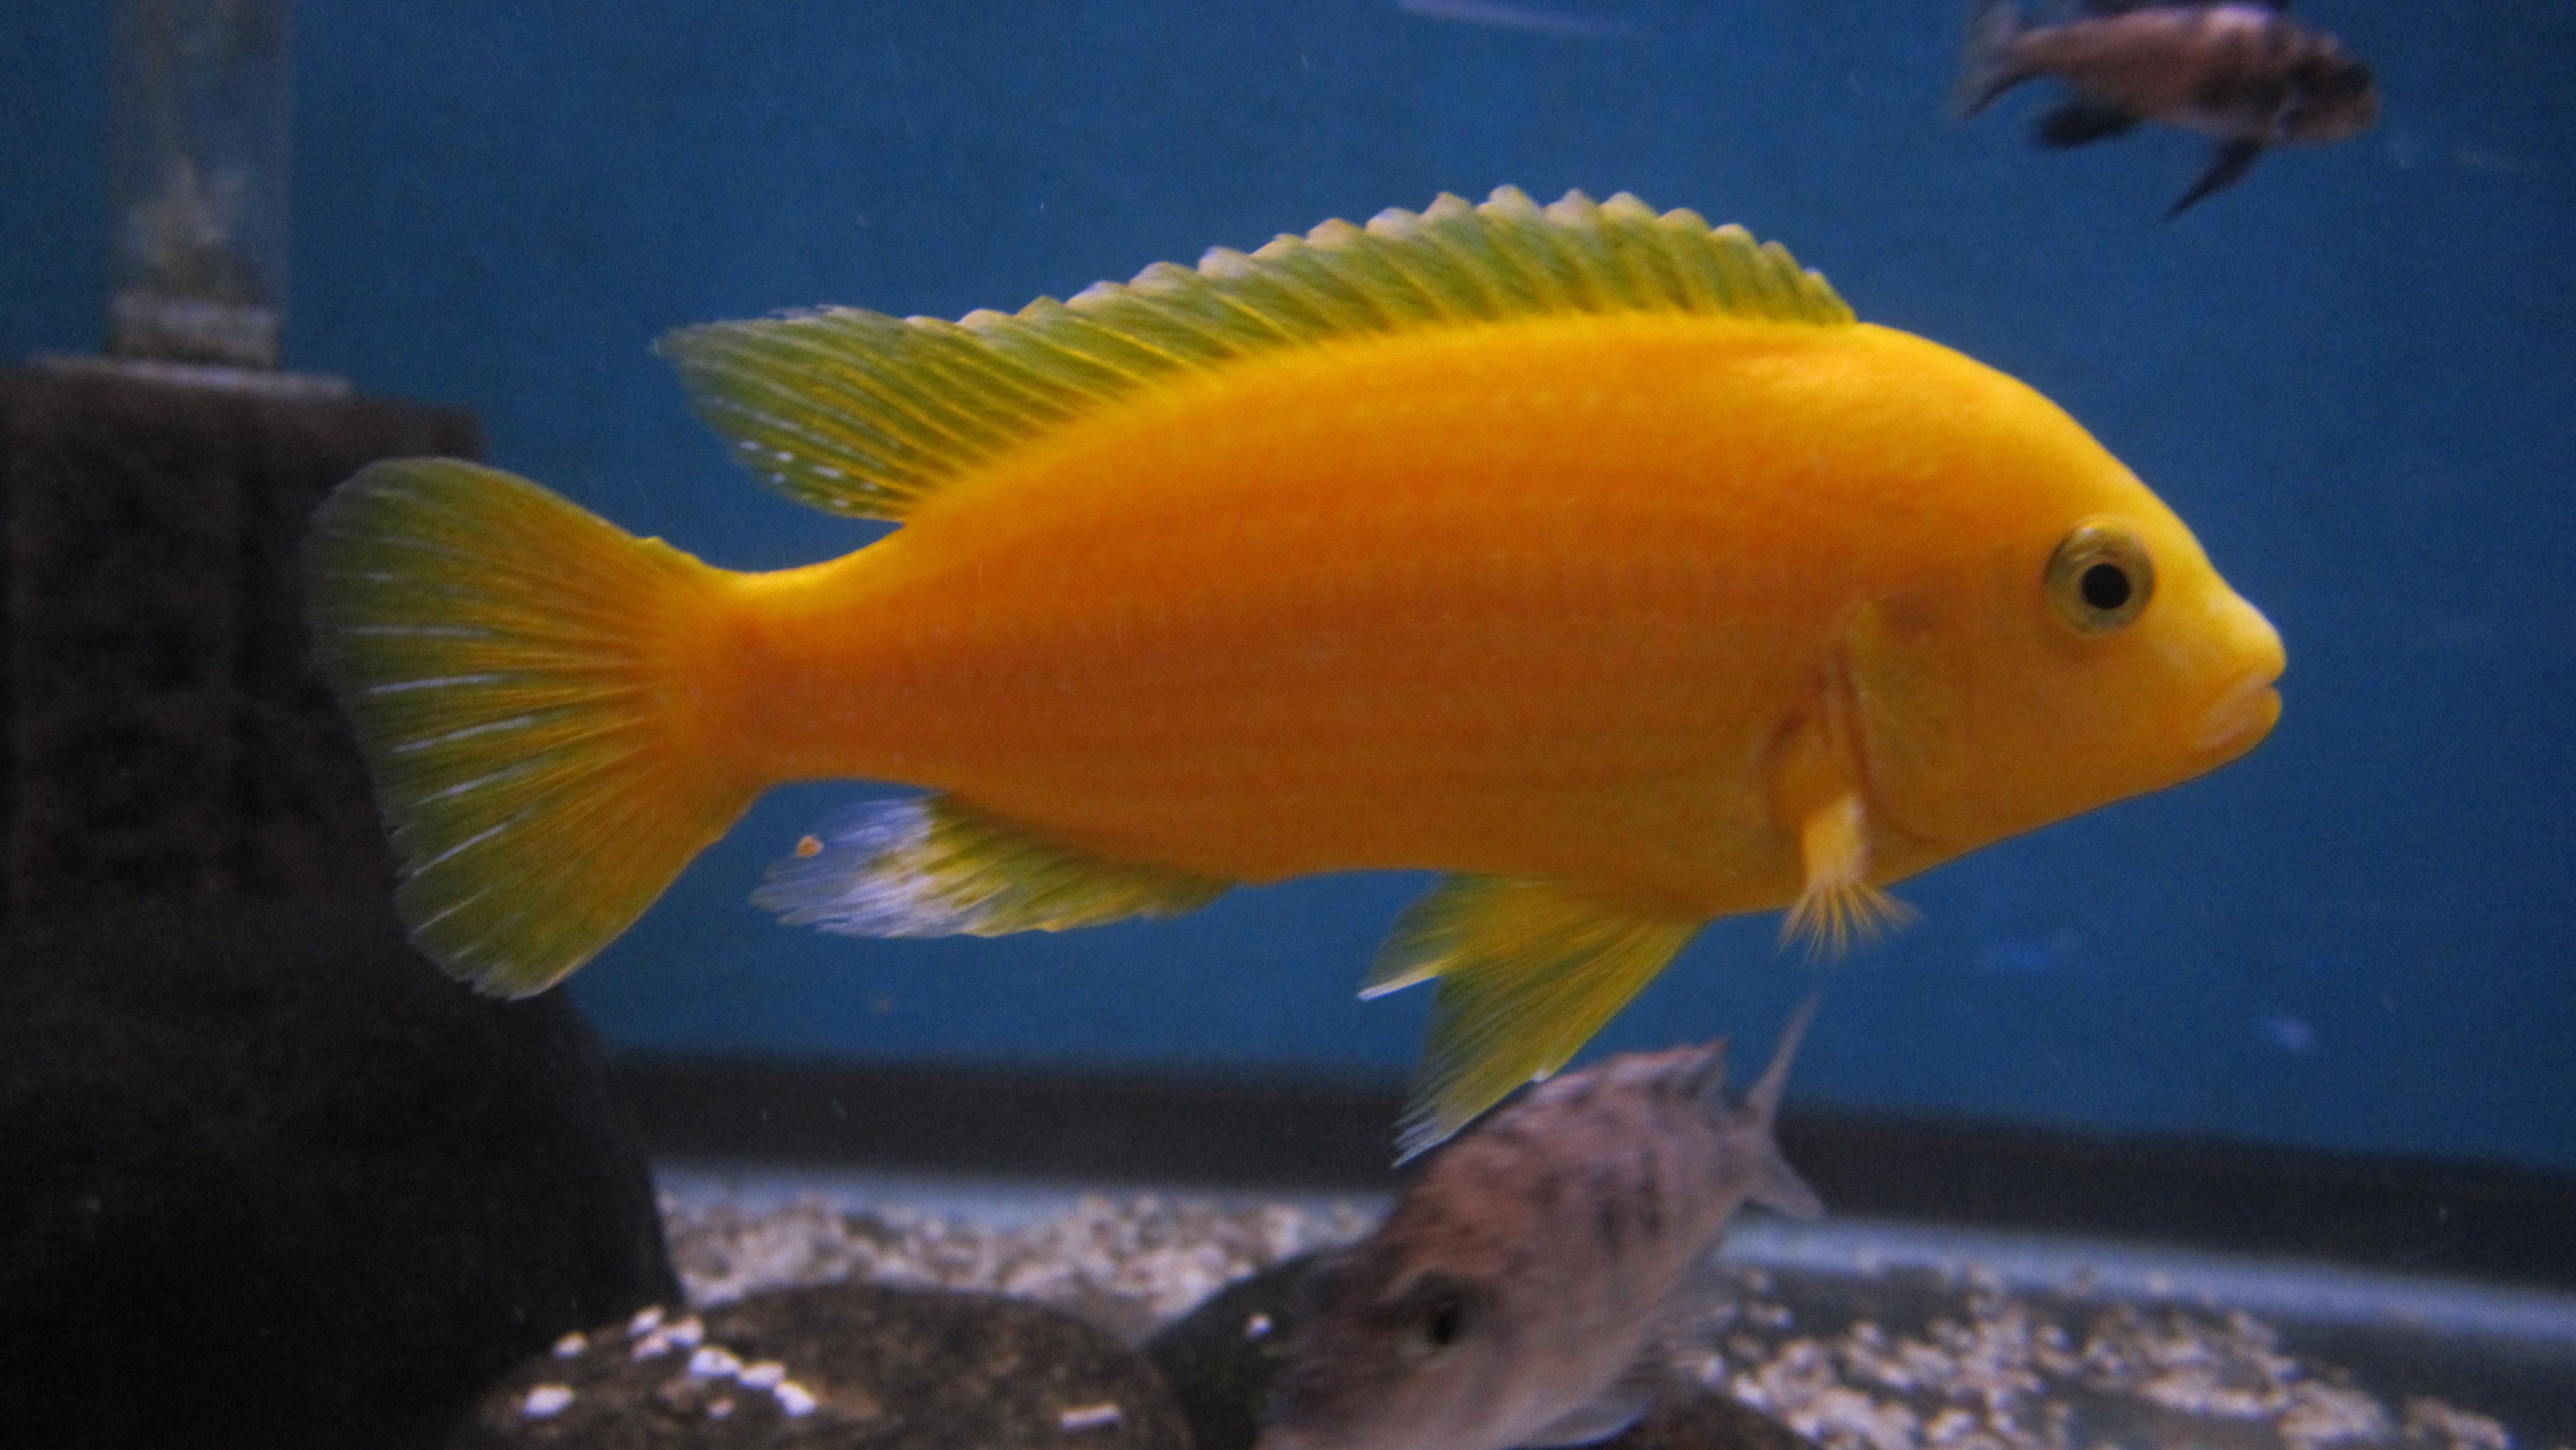 cichlidscom labidochromis caeruleus yellow lab